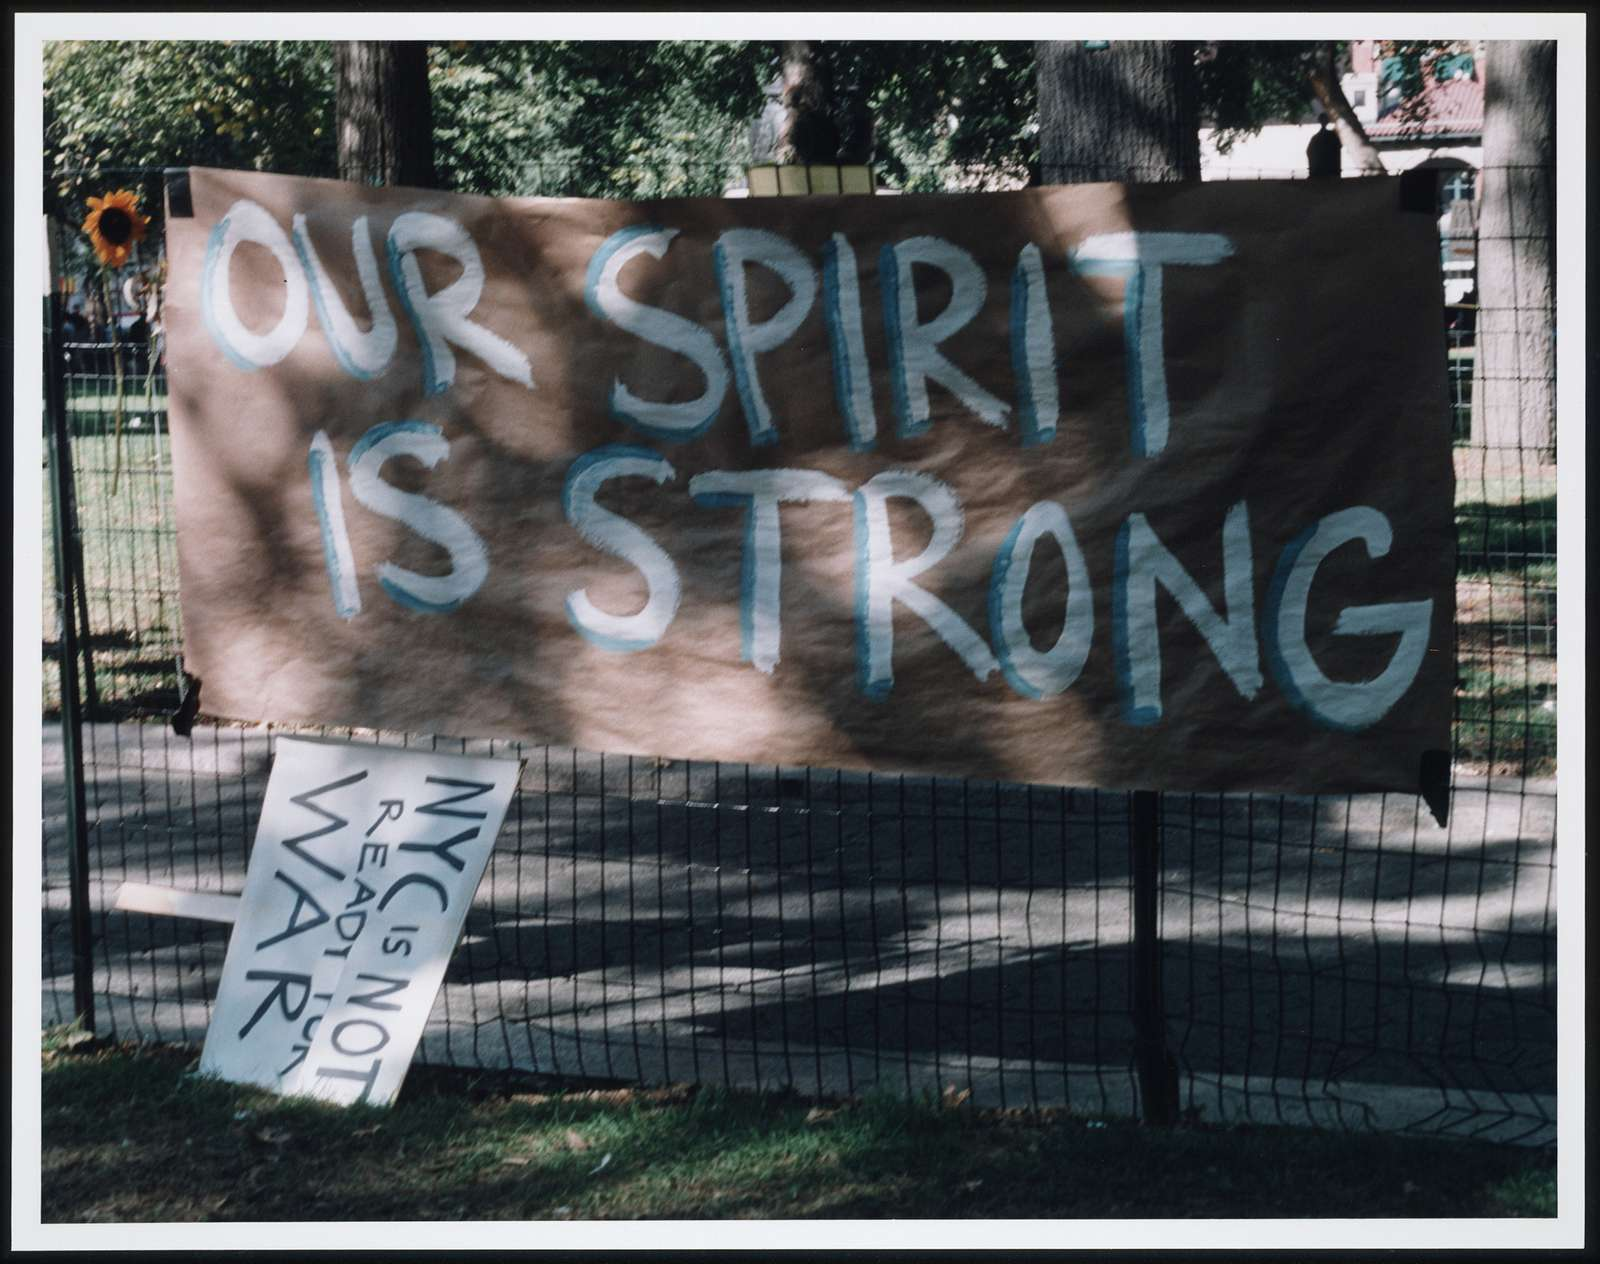 [Signs responding to the terrorist attack on the World Trade Center, New York City, September 11, 2001]